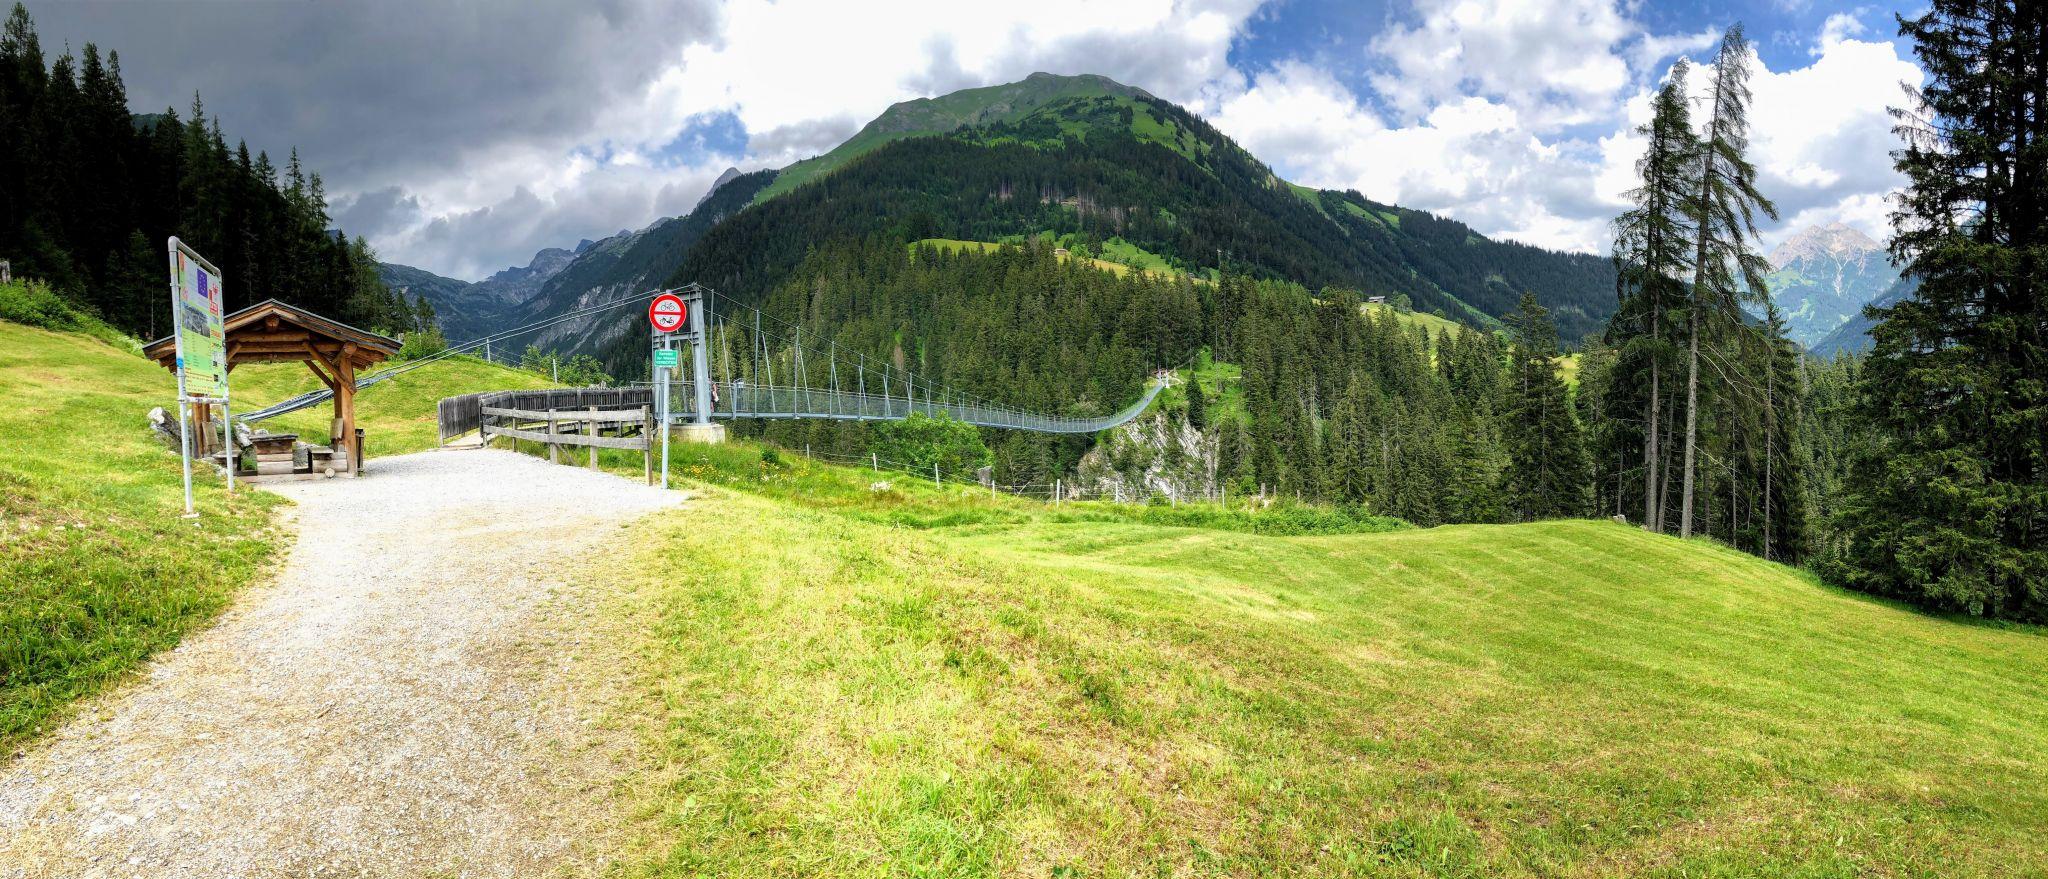 Hängebrücke Holzgau, Austria